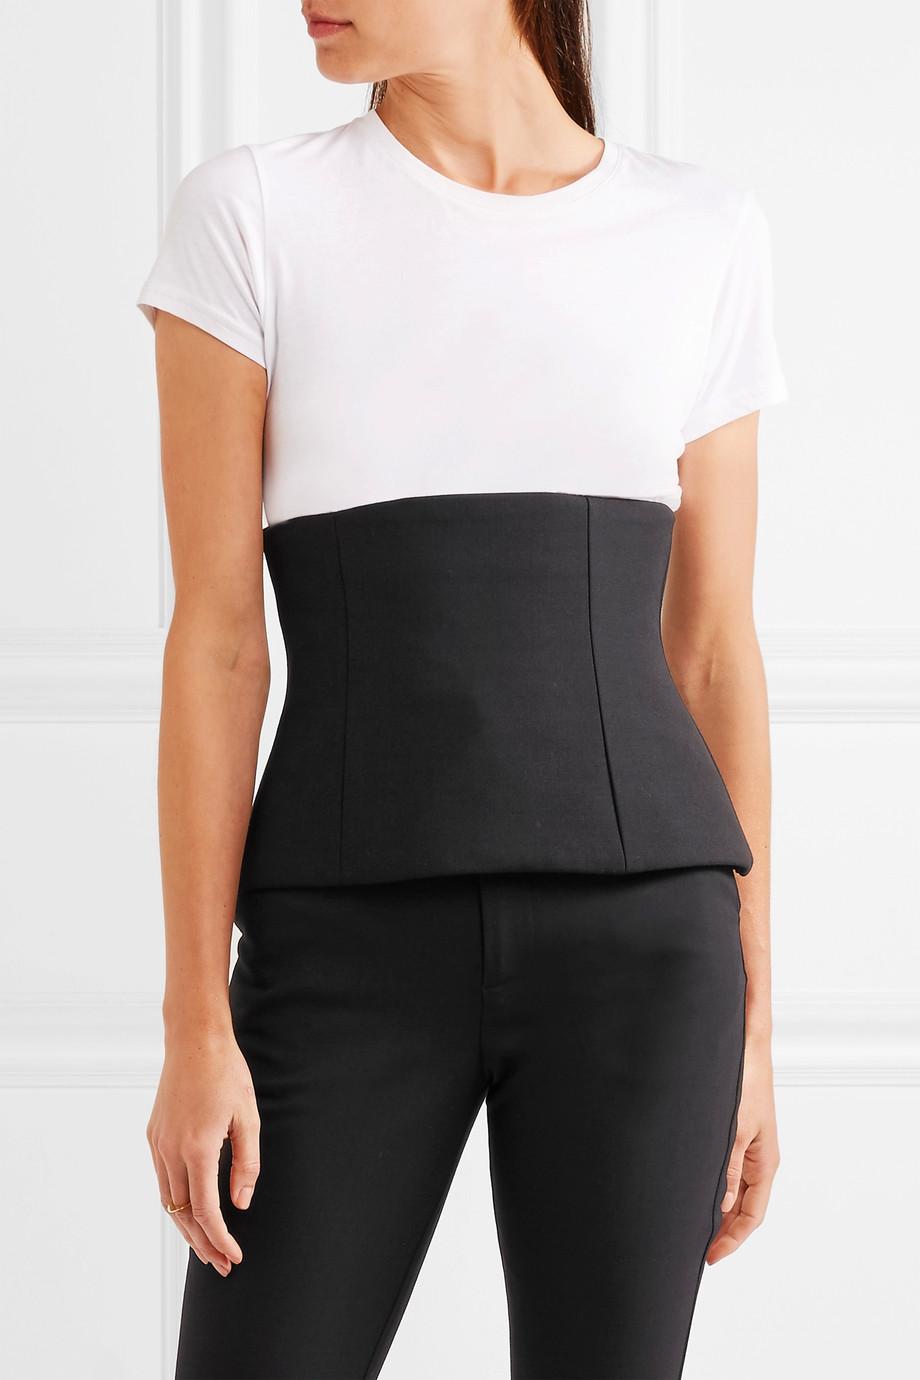 GEORGIA ALICE Twill corset, £275